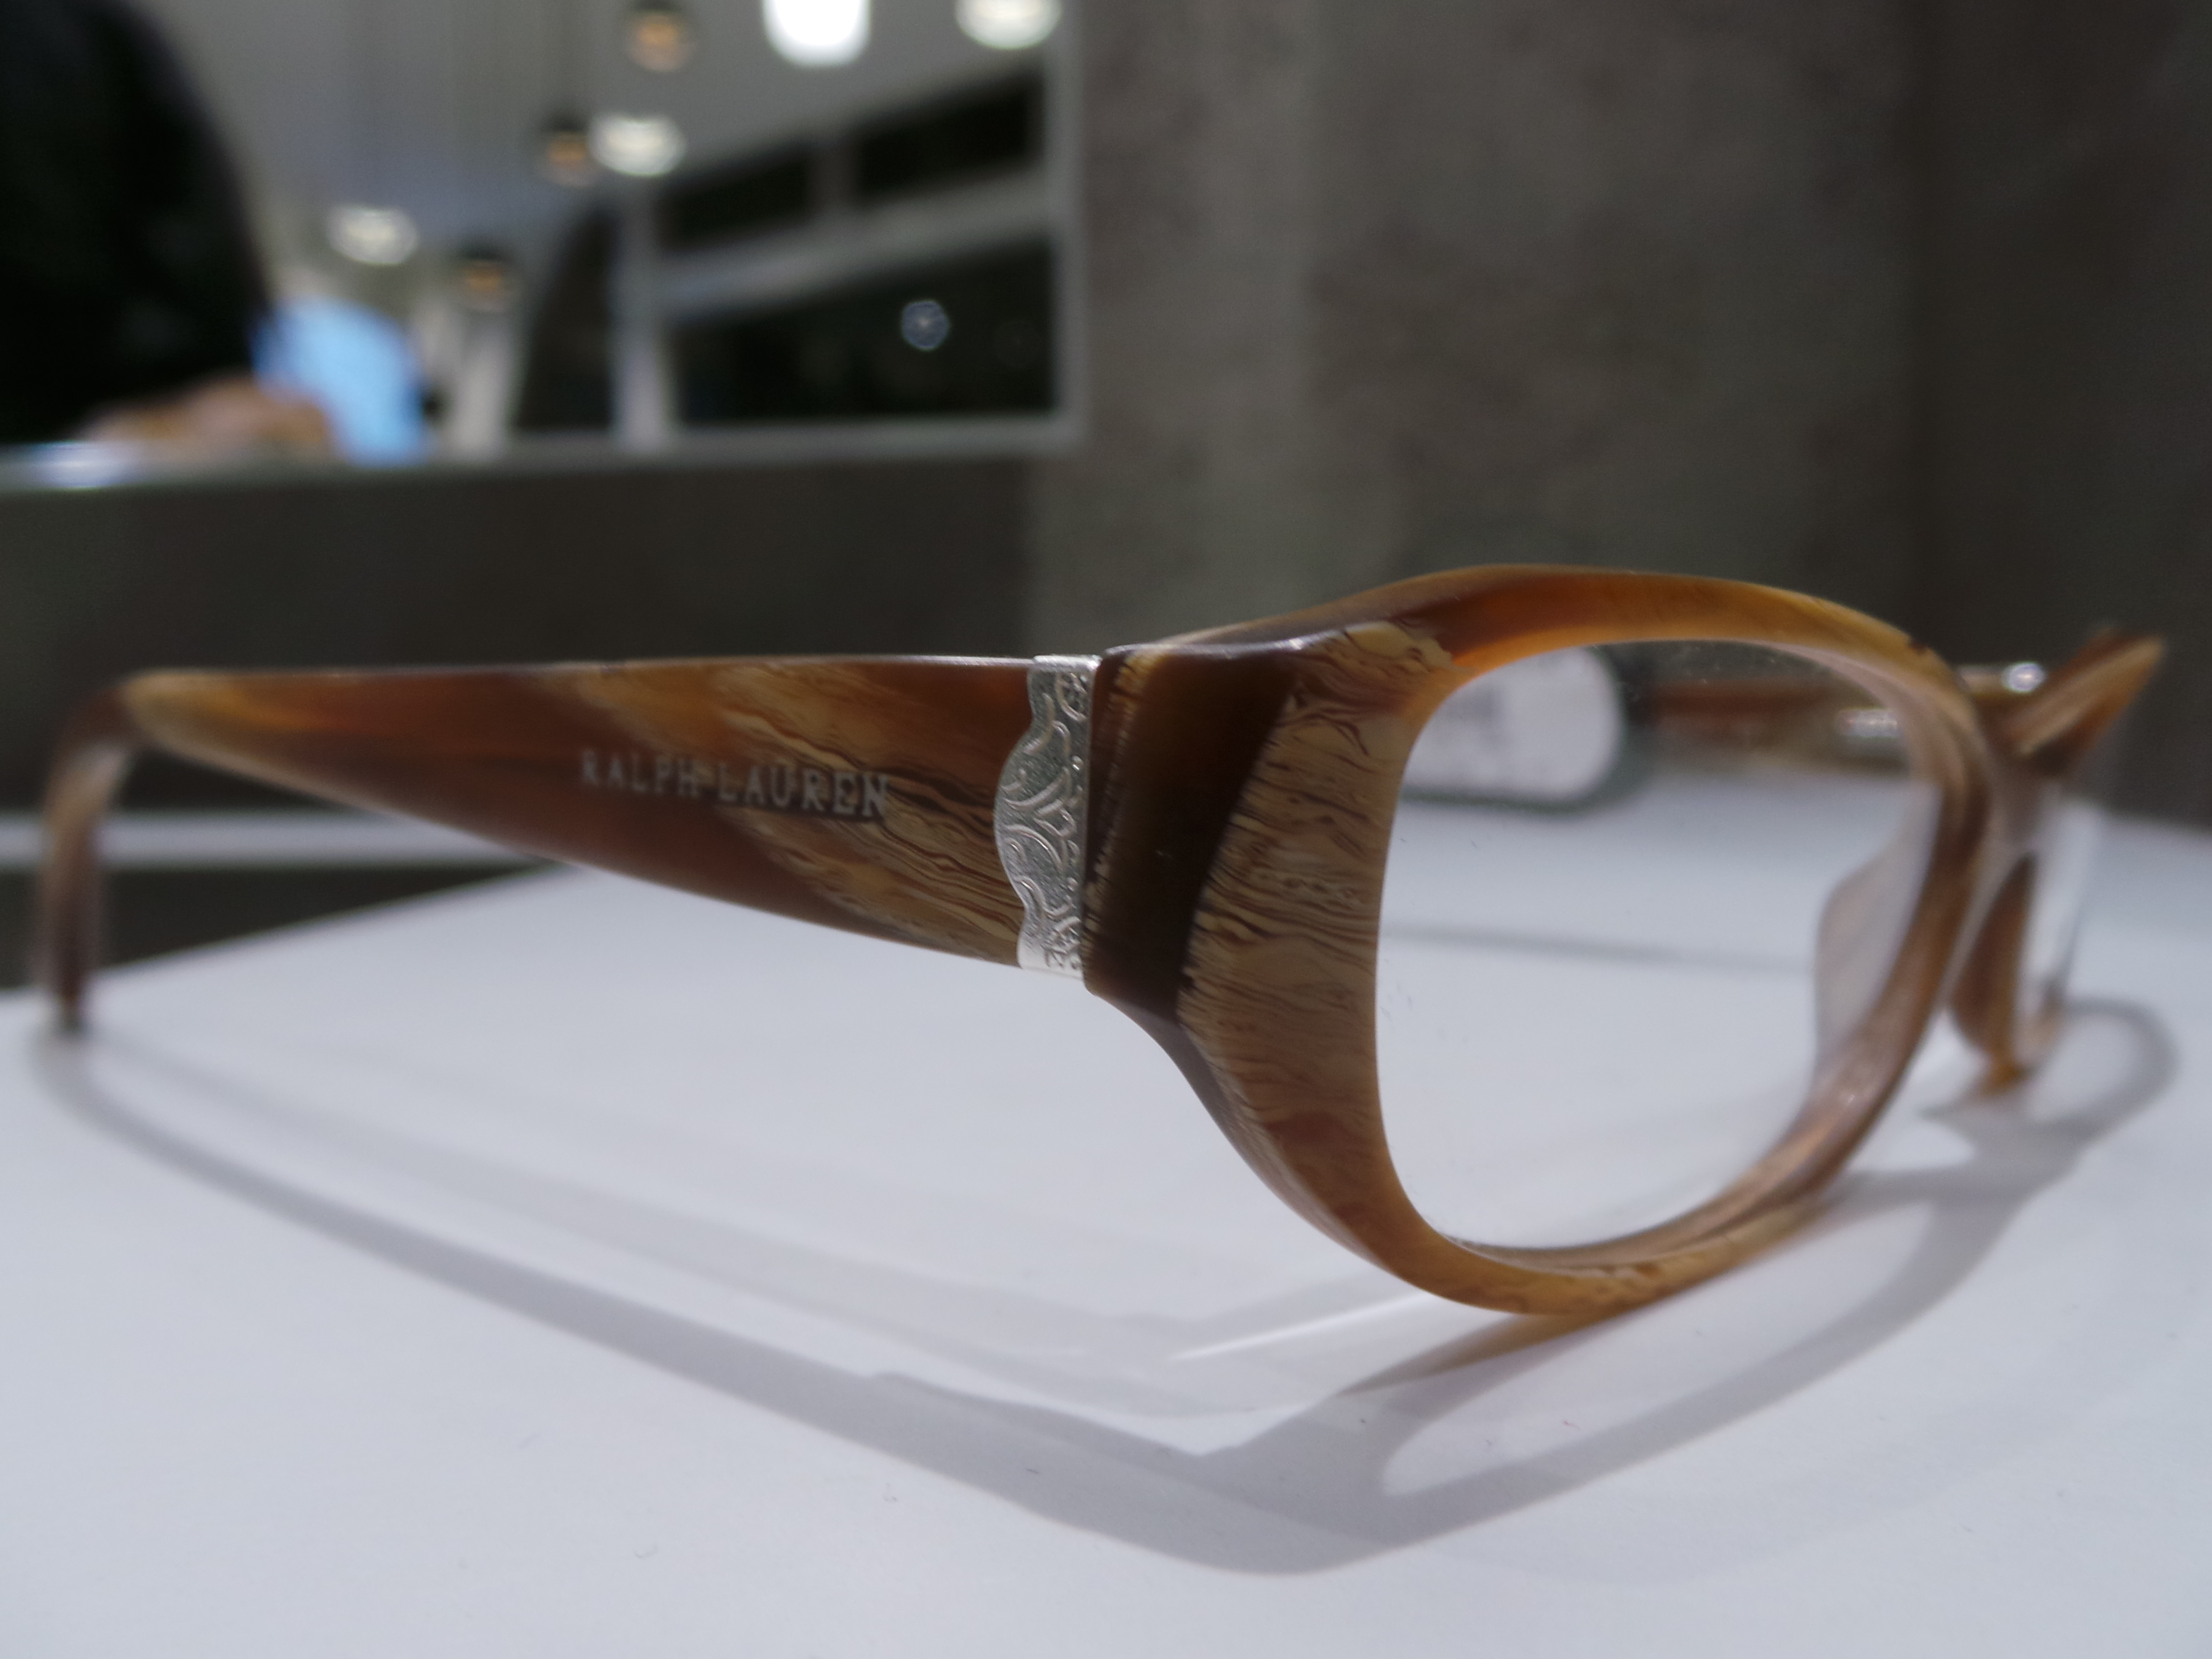 d0b1b908e2 The All New Ralph Lauren Eyewear Collection at Vision Express ...